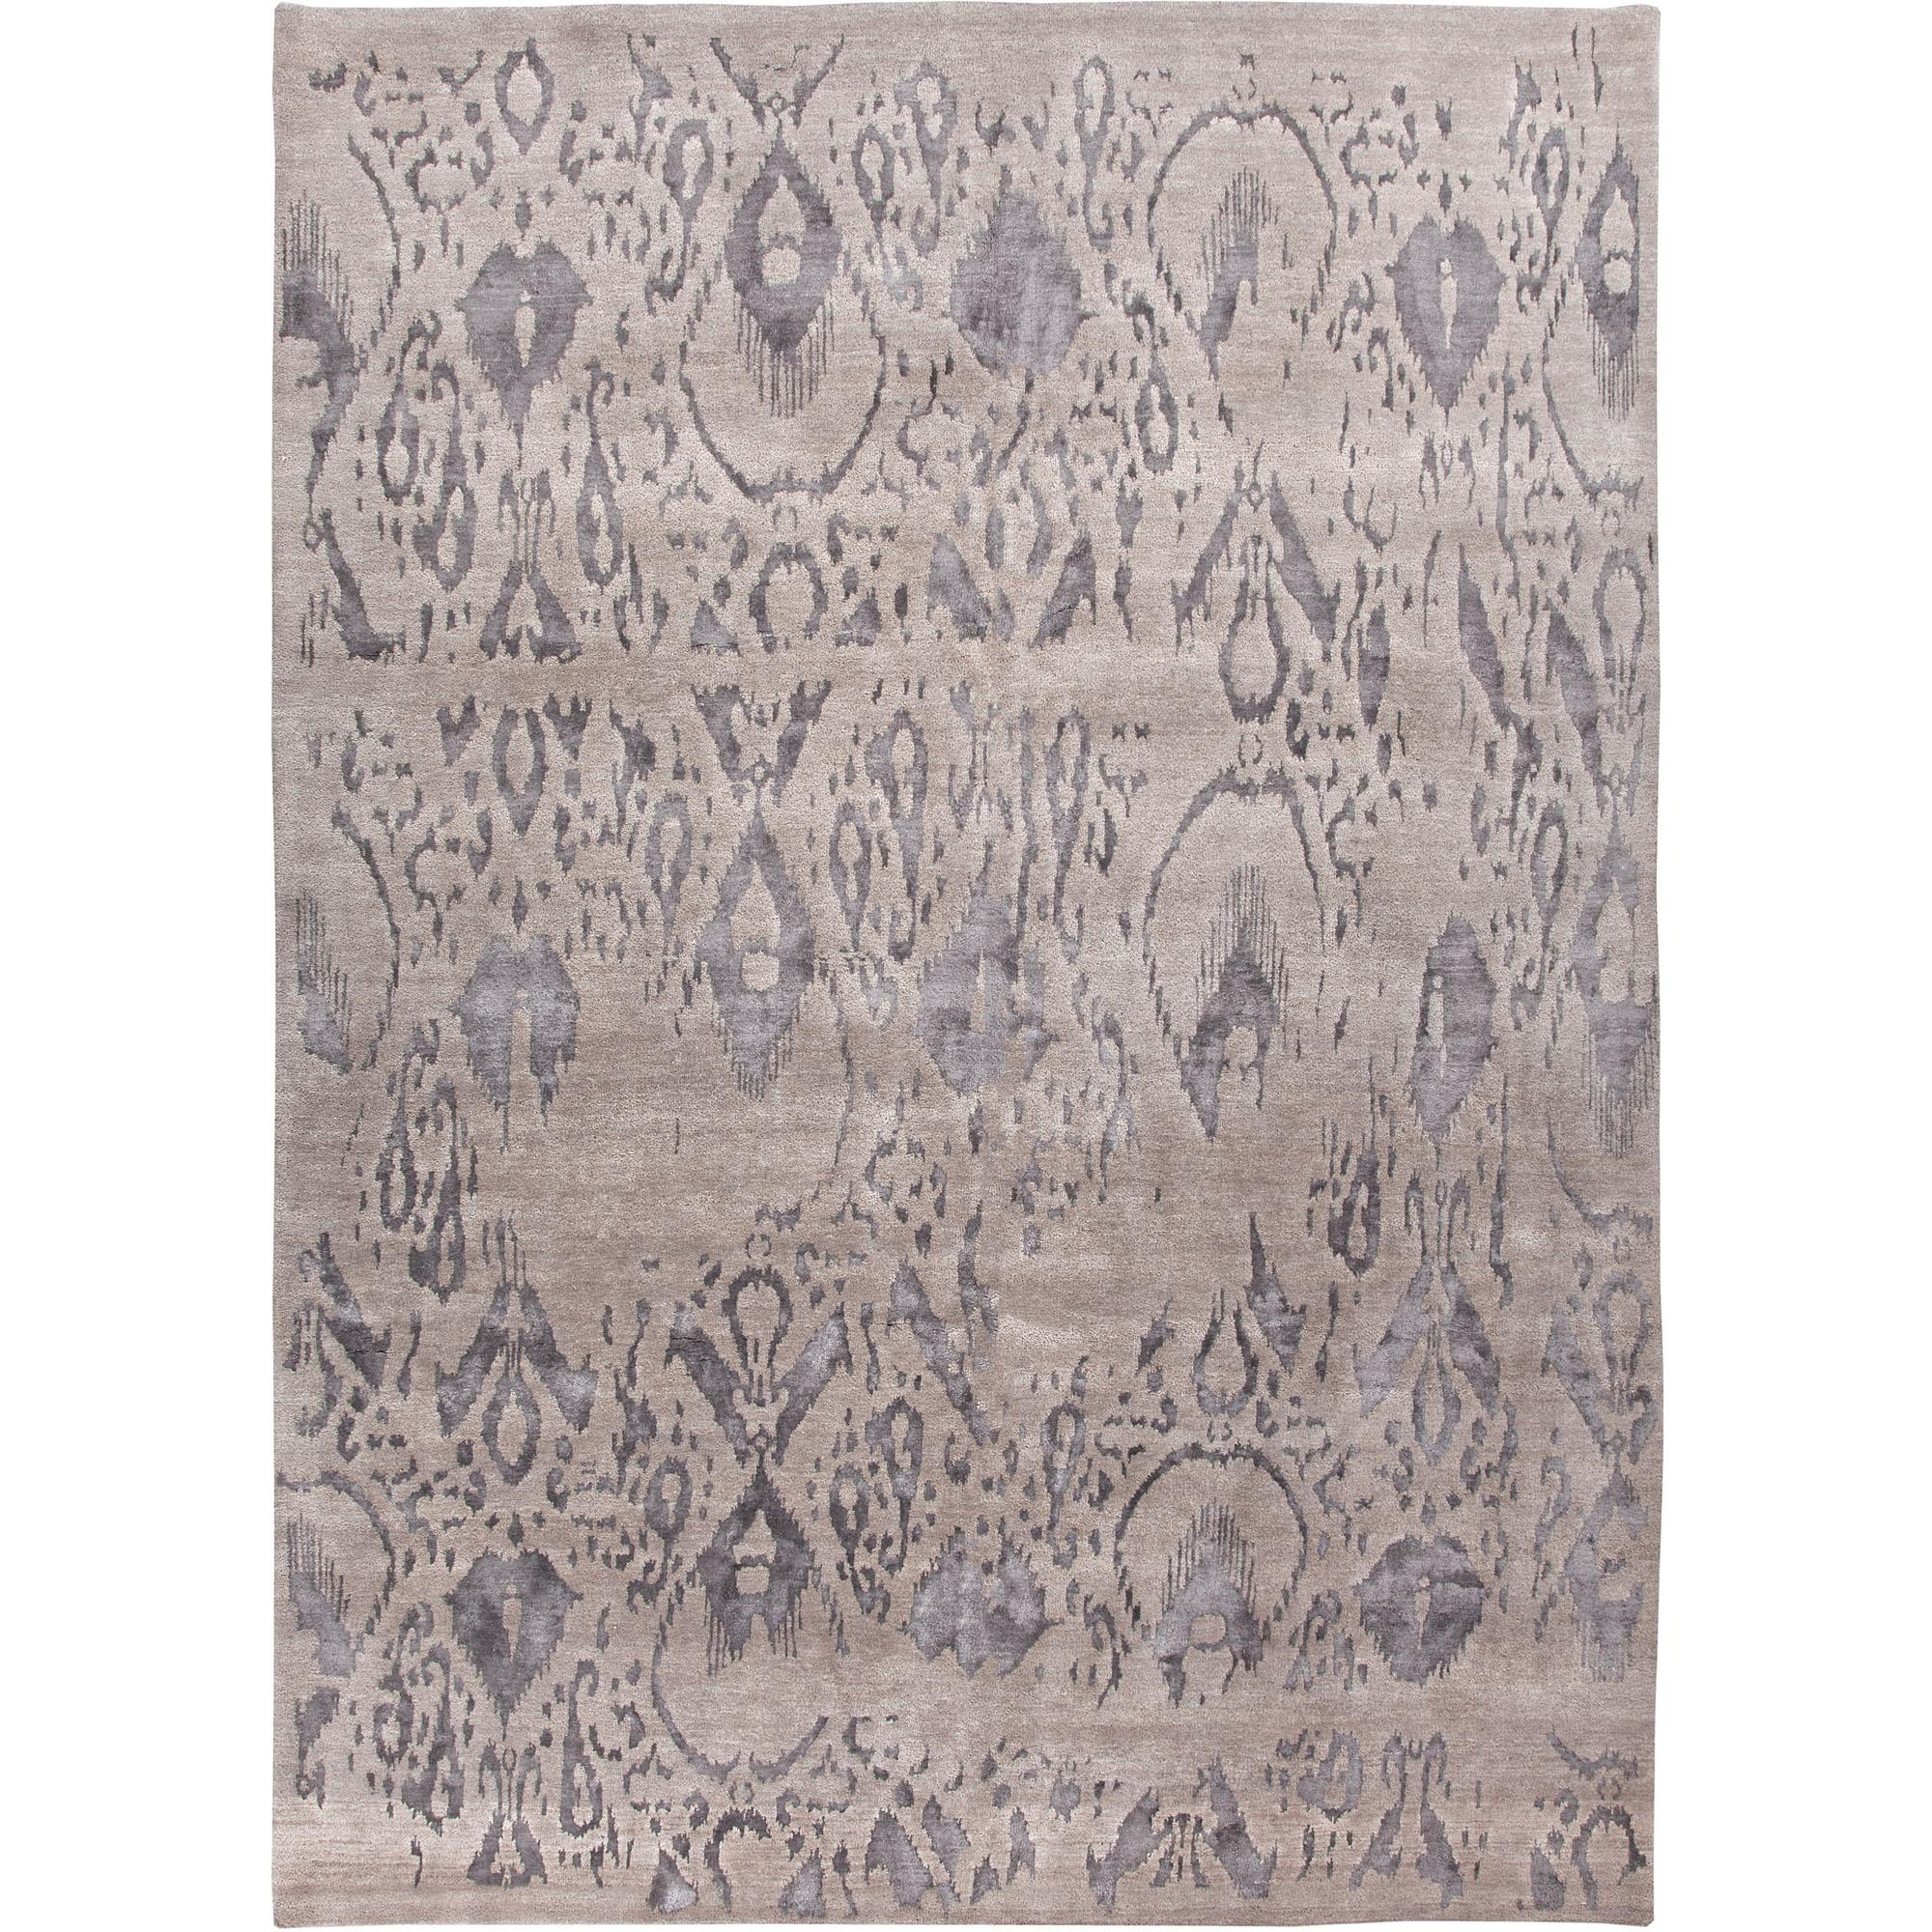 JAIPUR Rugs Connextion By Jenny Jones-global 5 x 8 Rug - Item Number: RUG100994